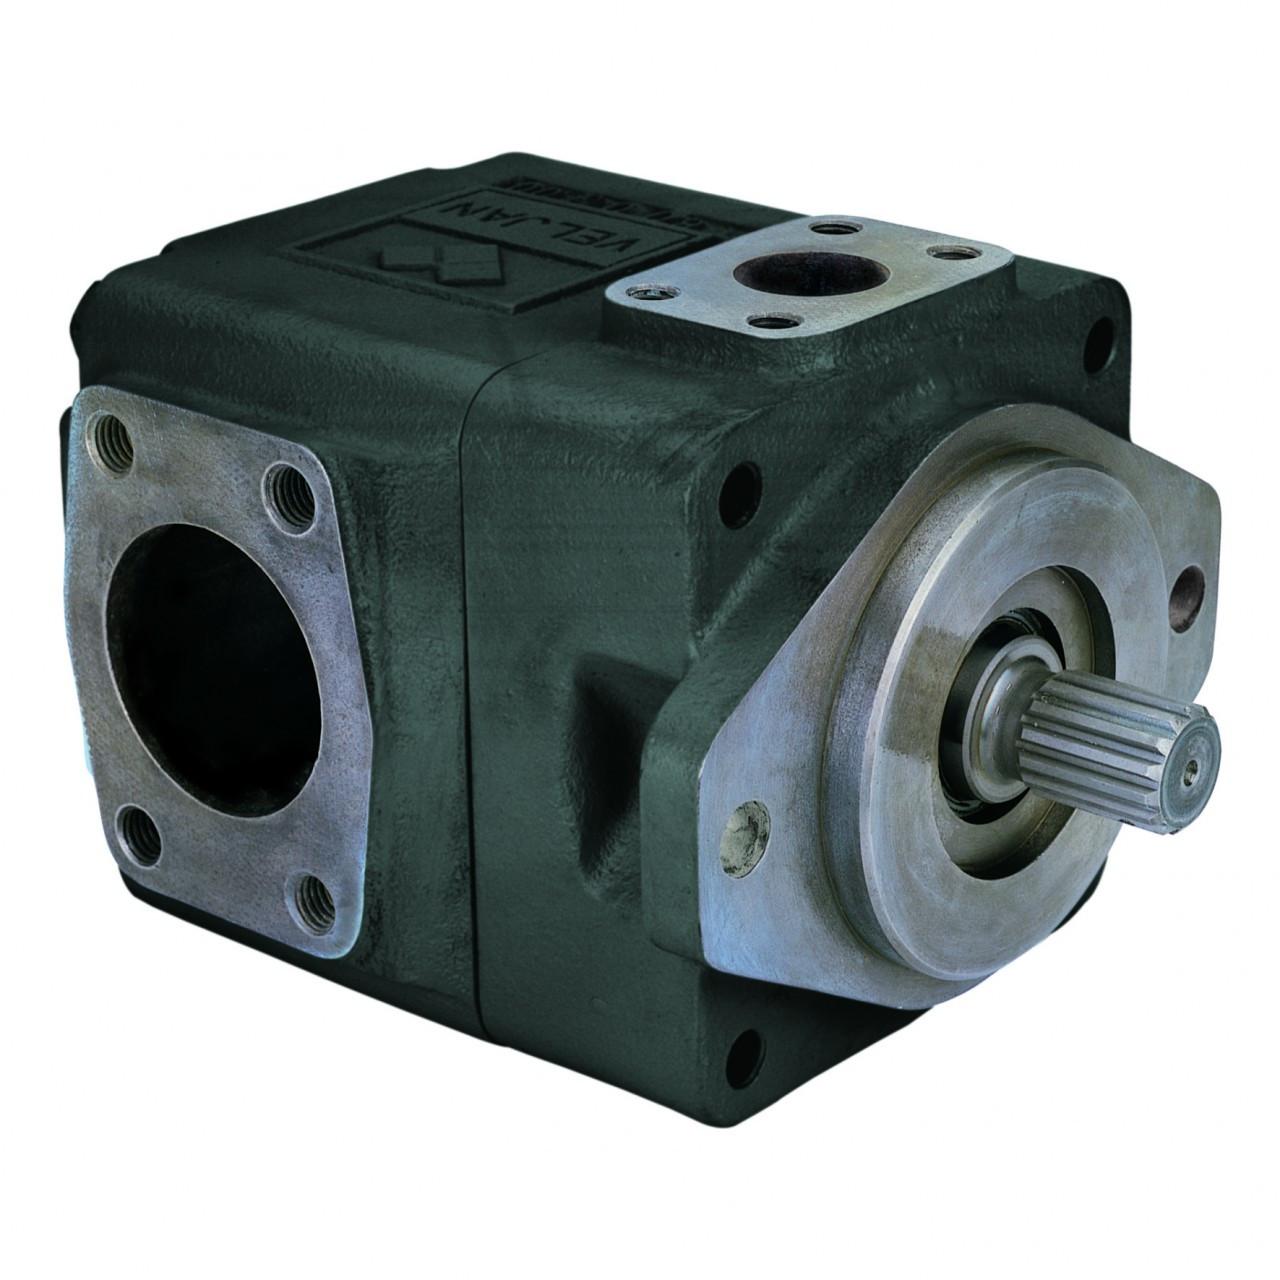 Veljan Single Vane Pump - VT7E / VT7ES - Rons Drivelines | Drivelines | Driveshafts